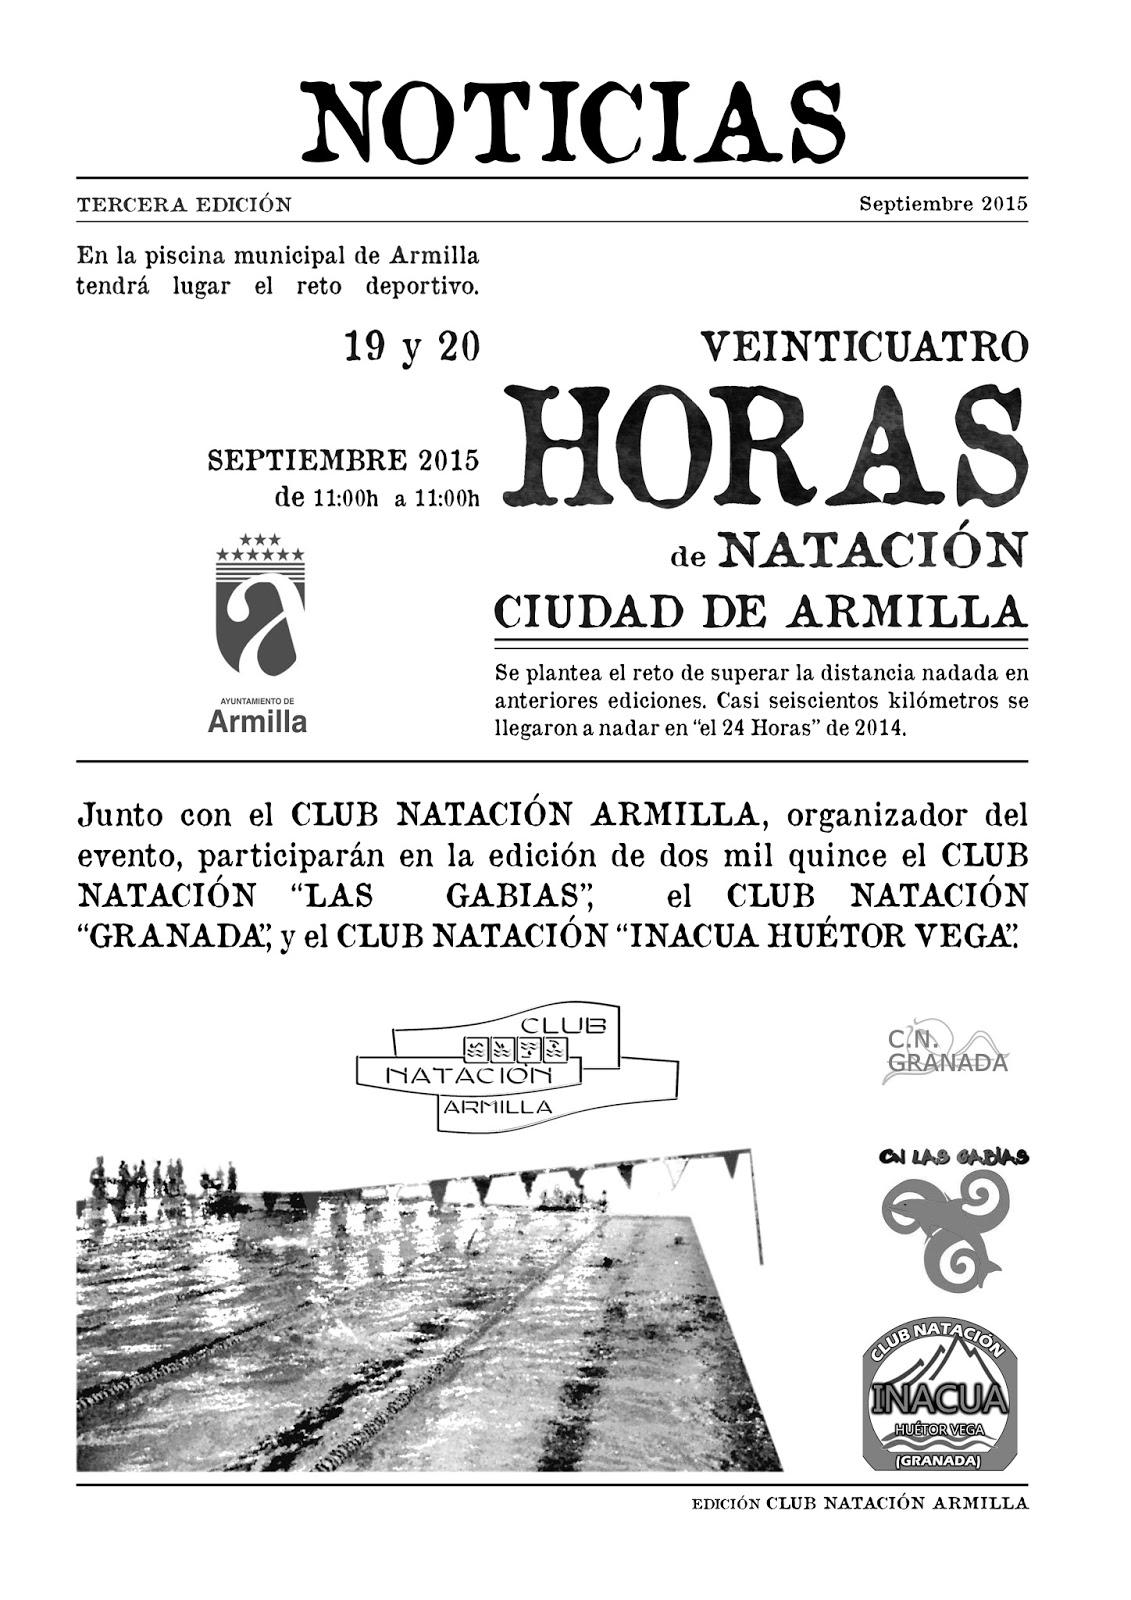 Club nataci n armilla veinticuatro horas de nataci n for Piscina municipal de granada